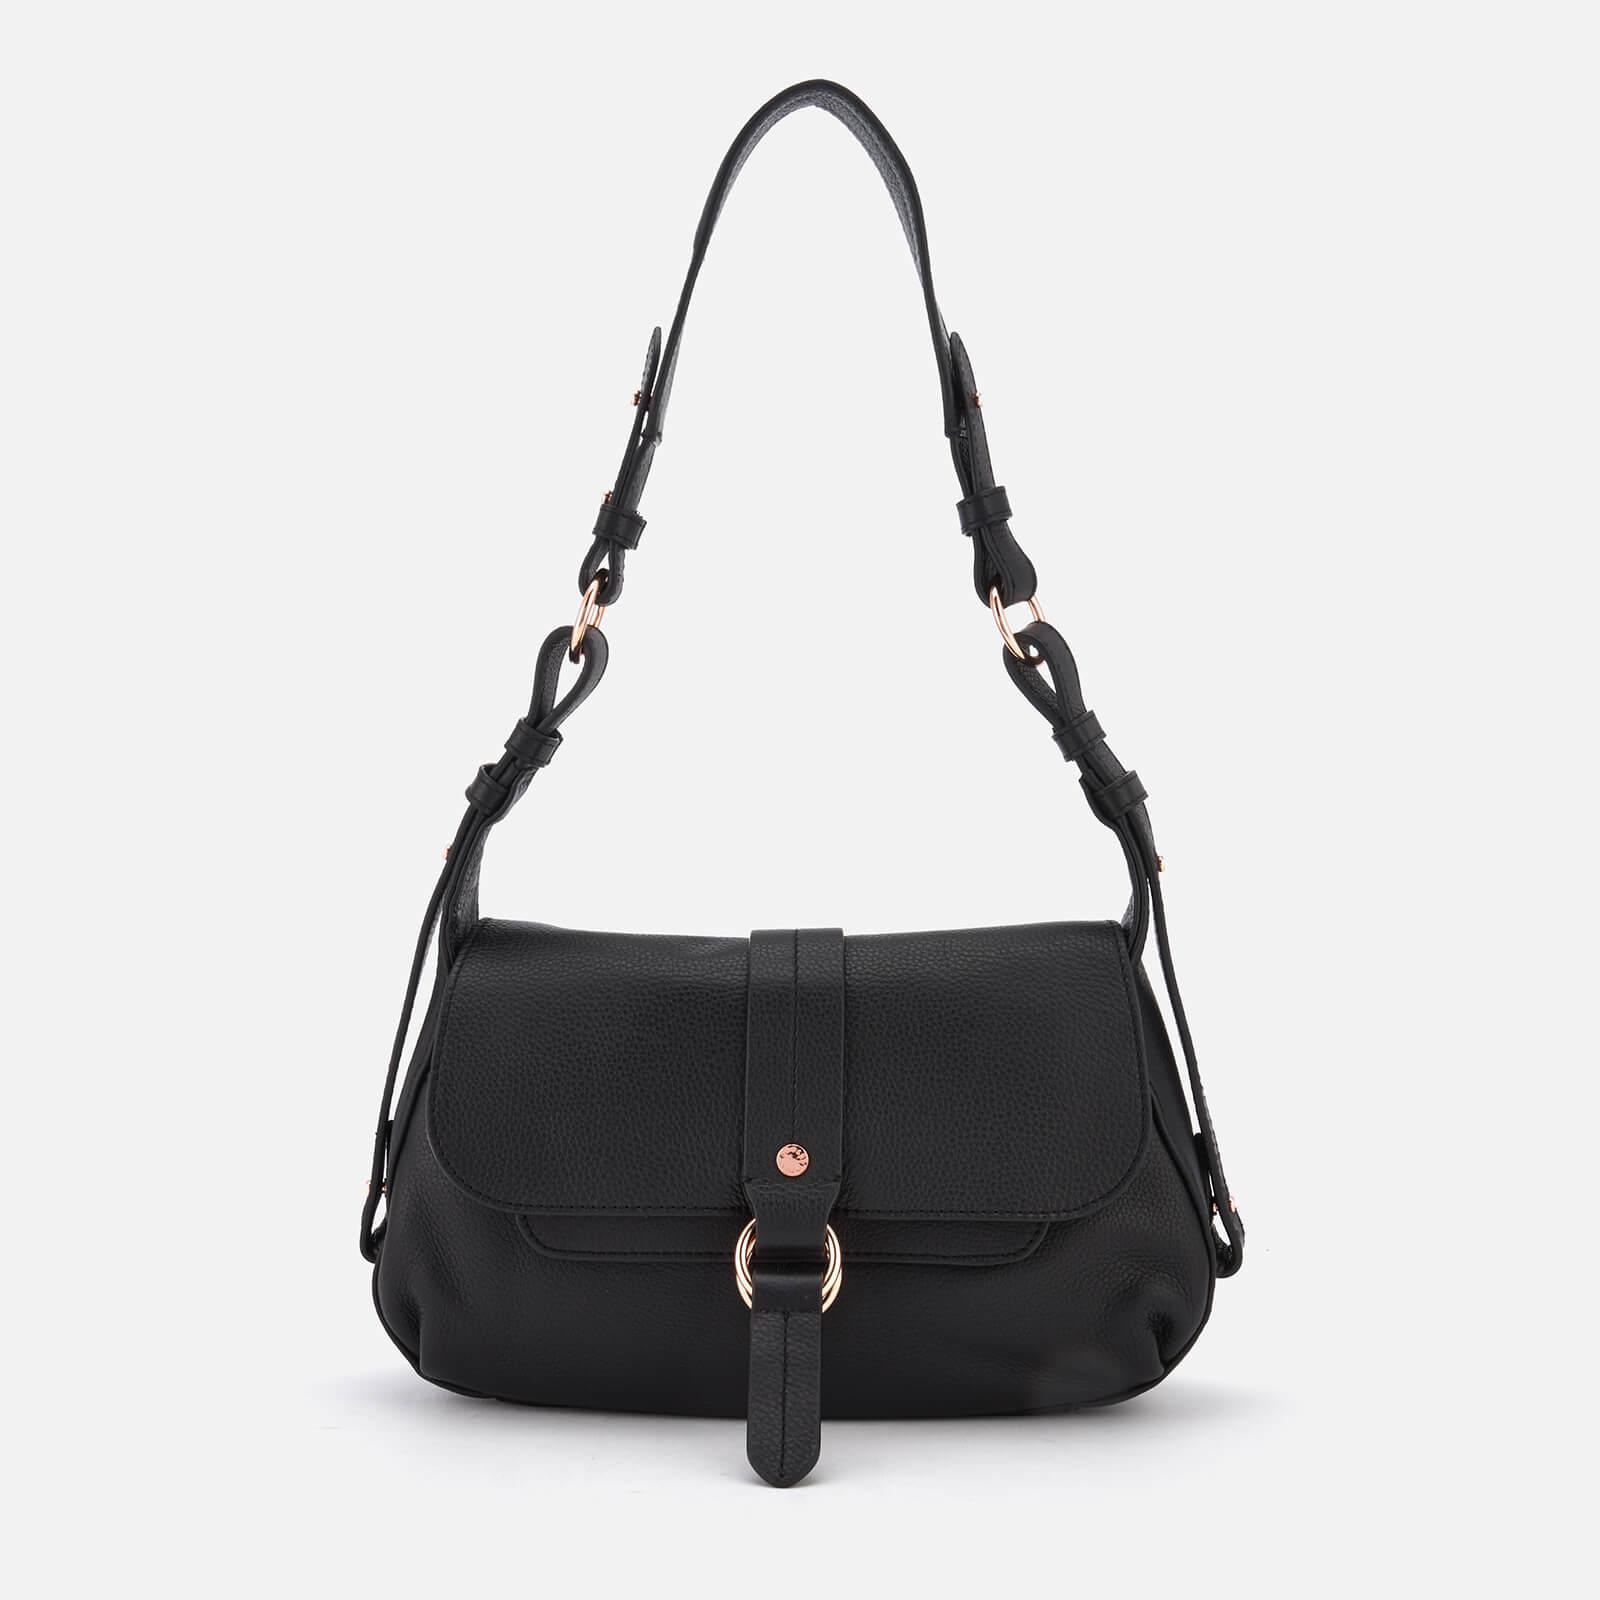 a2423e9c32fe Lyst - Radley Trinity Square Medium Flapover Shoulder Bag in Black